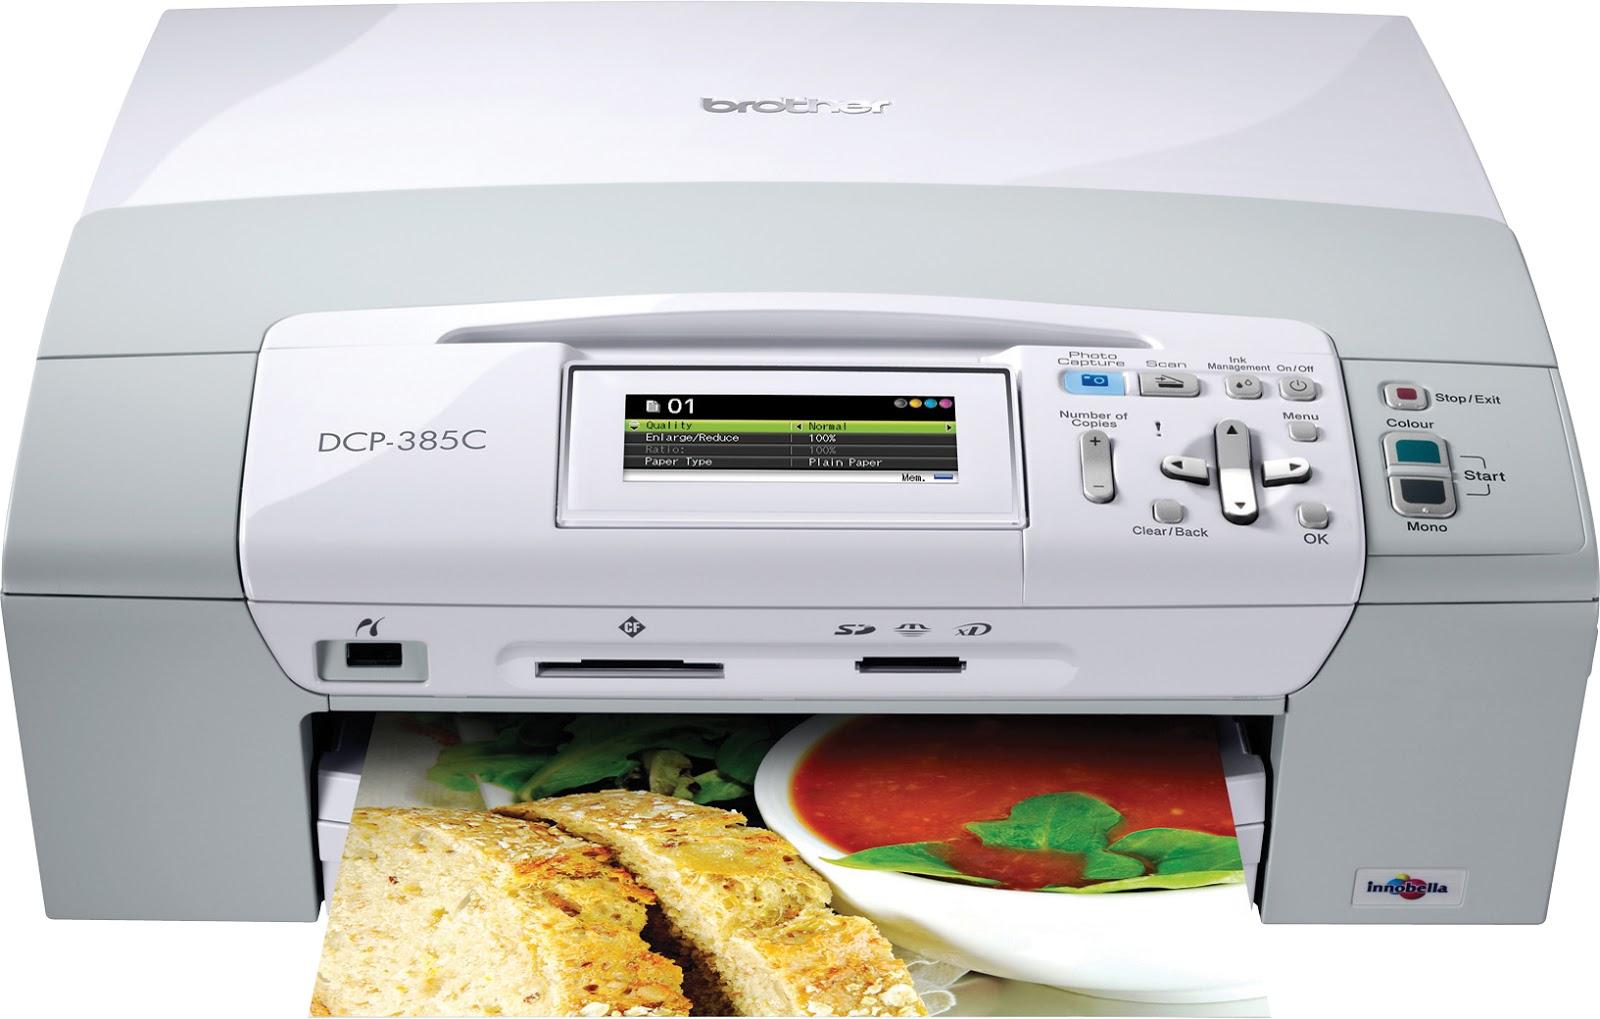 Brother dcp-385c multifunction colour inkjet printer *refurbished.